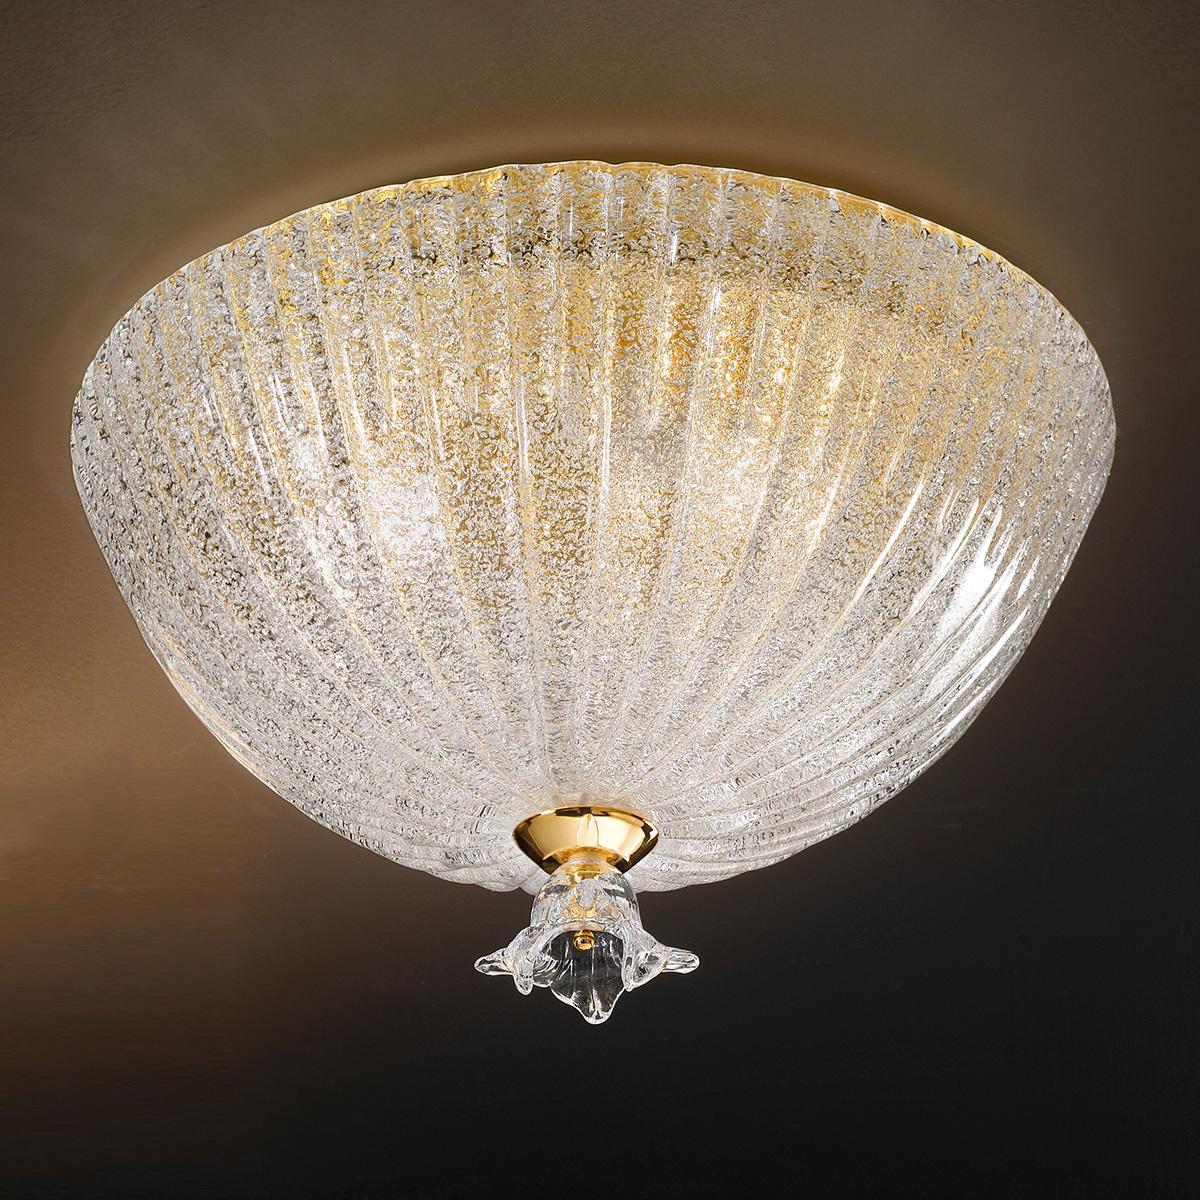 """Severa "" lampara de techo de Murano - 3 luces - ""rugiada"" transparente"